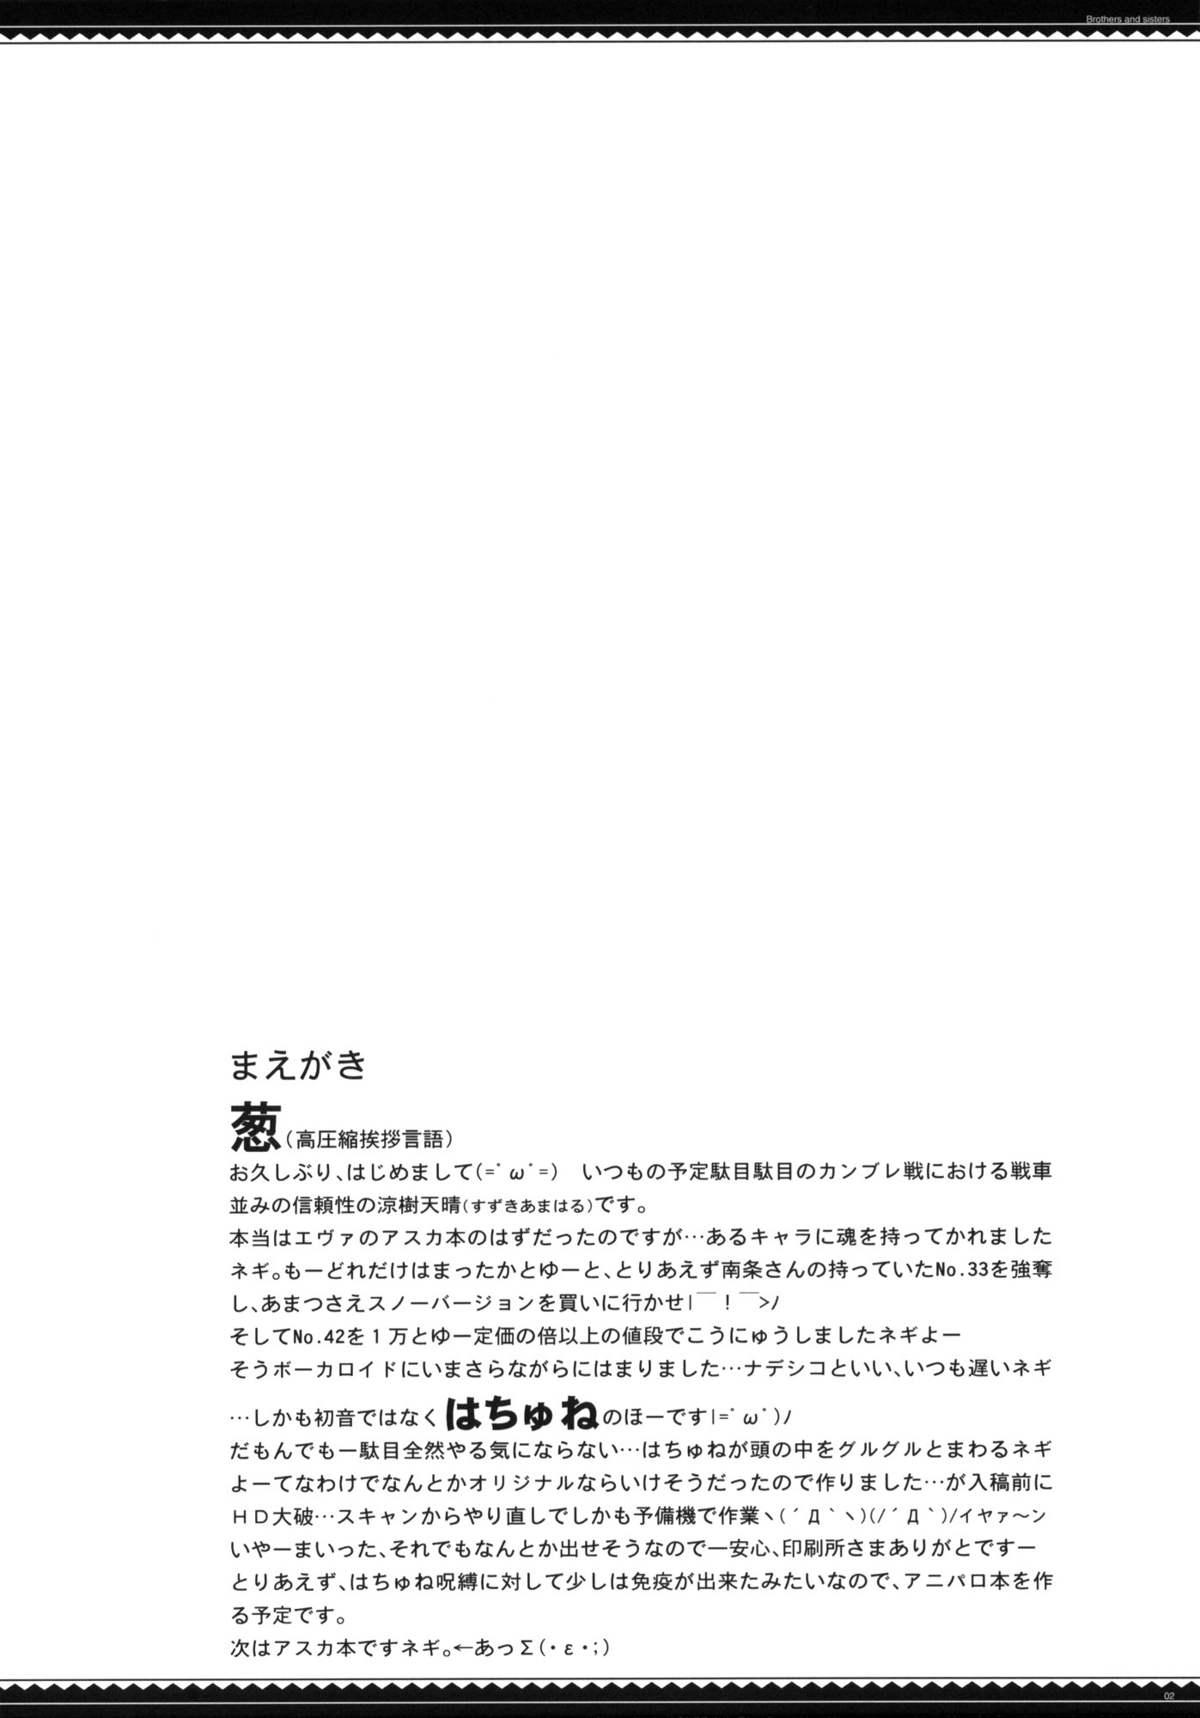 (COMITIA92)[JIBAKU SYSTEM] Sitei-sitei- Kinshin Soukan Goukan Mousouhon (Original) 1